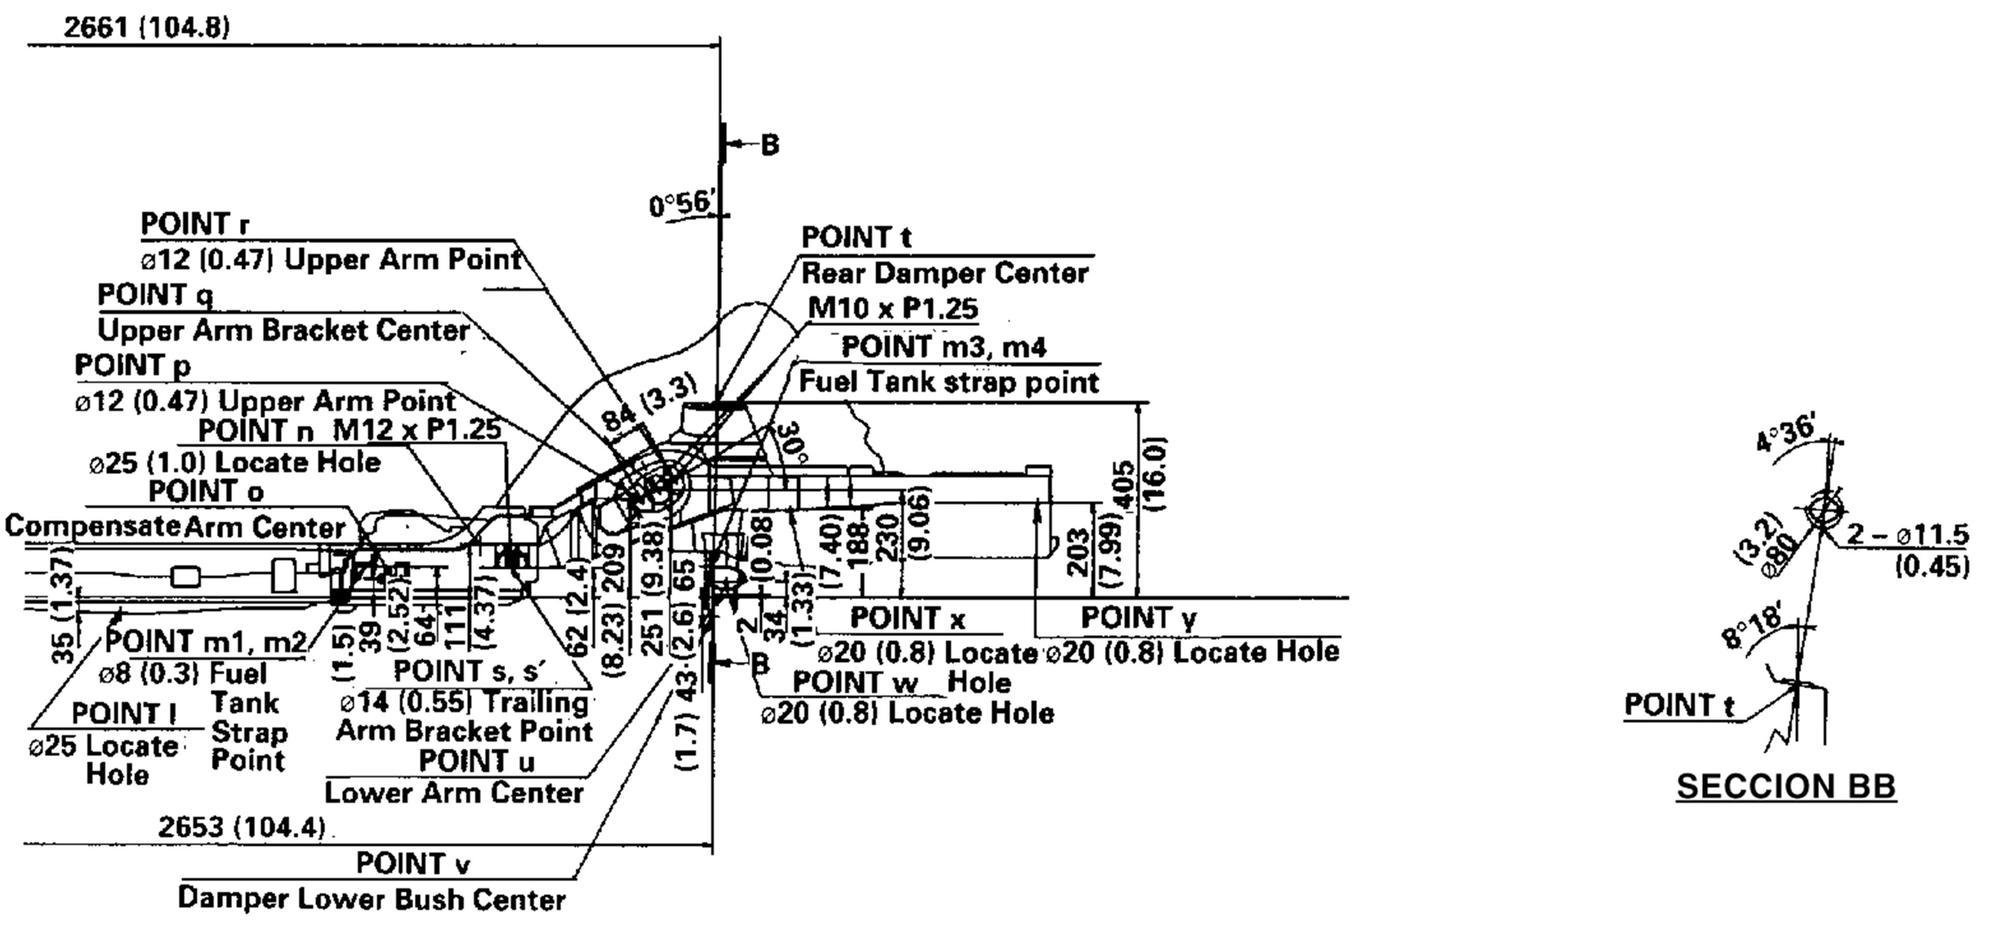 House Wiring Diagram Wiring Diagram Sony Xplod Gt21w Stereo Fixya